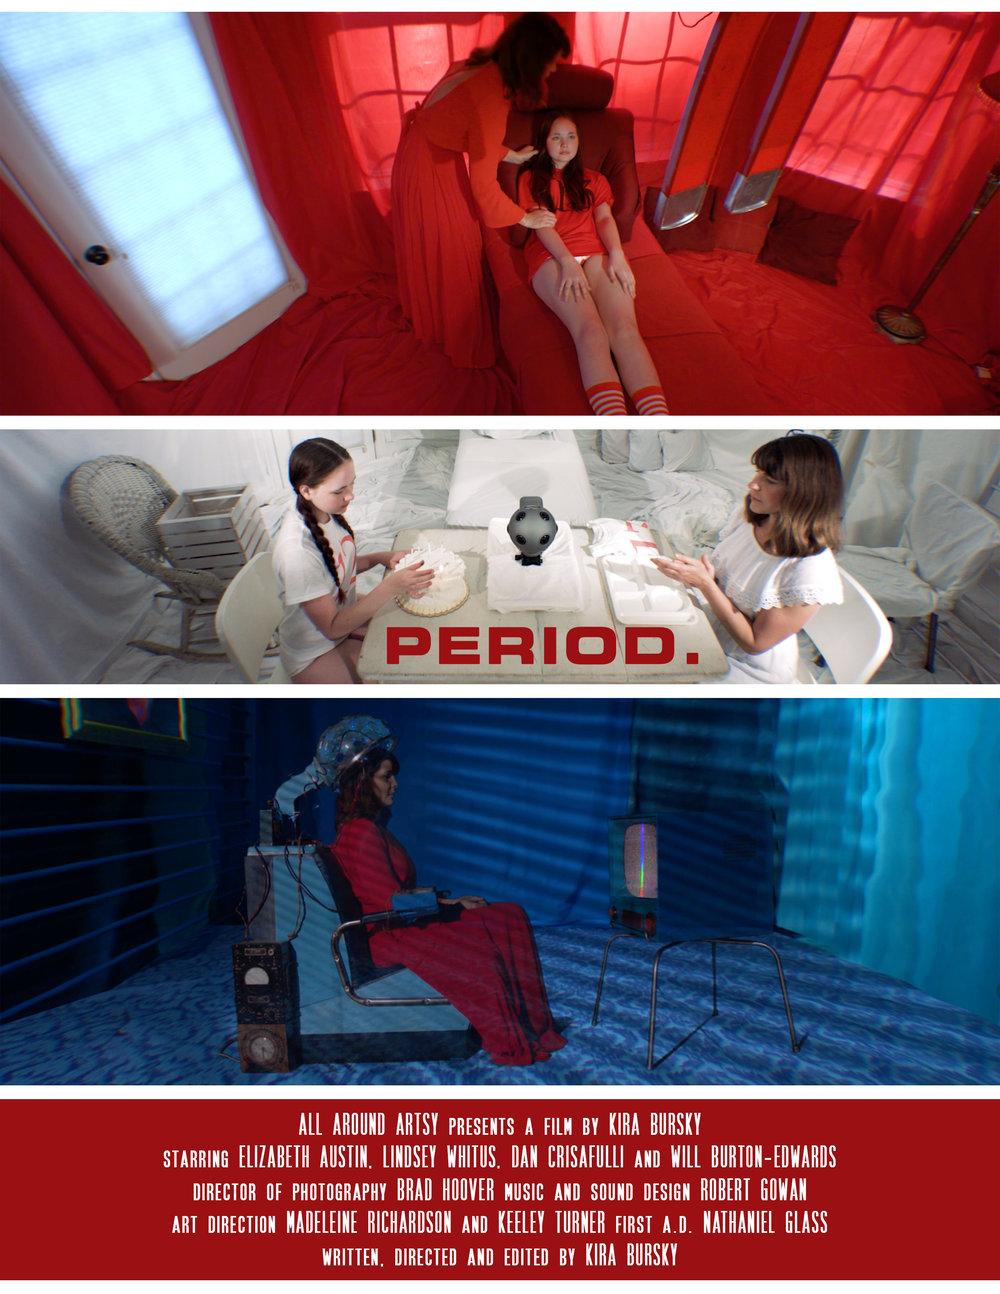 Period. Poster v2.2.jpg